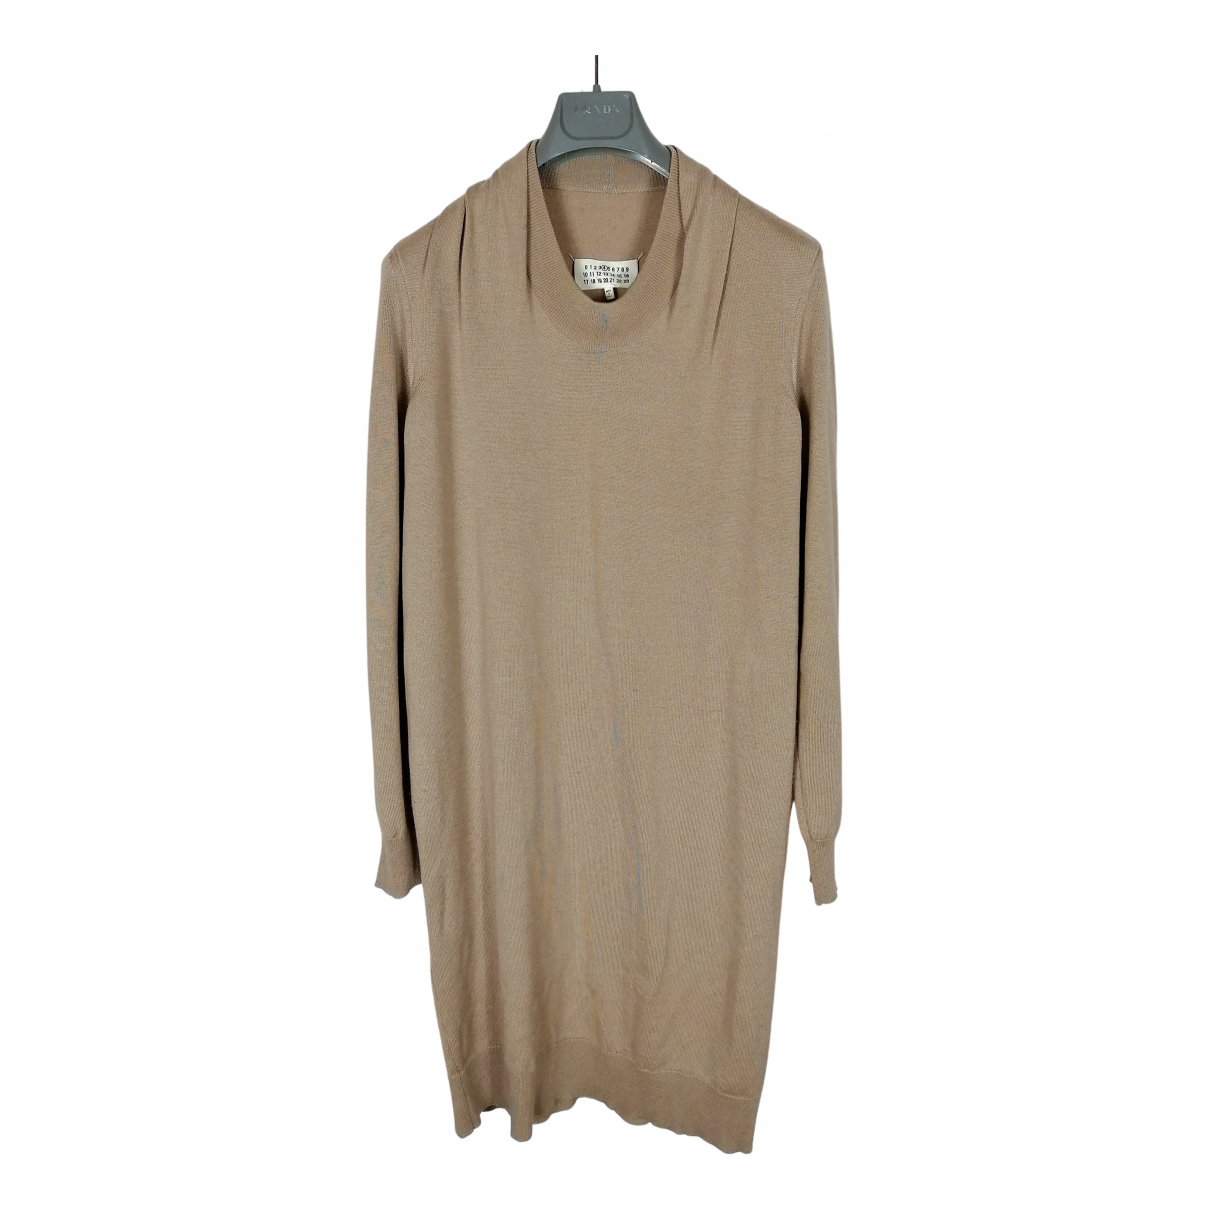 Maison Martin Margiela \N Kleid in  Beige Wolle